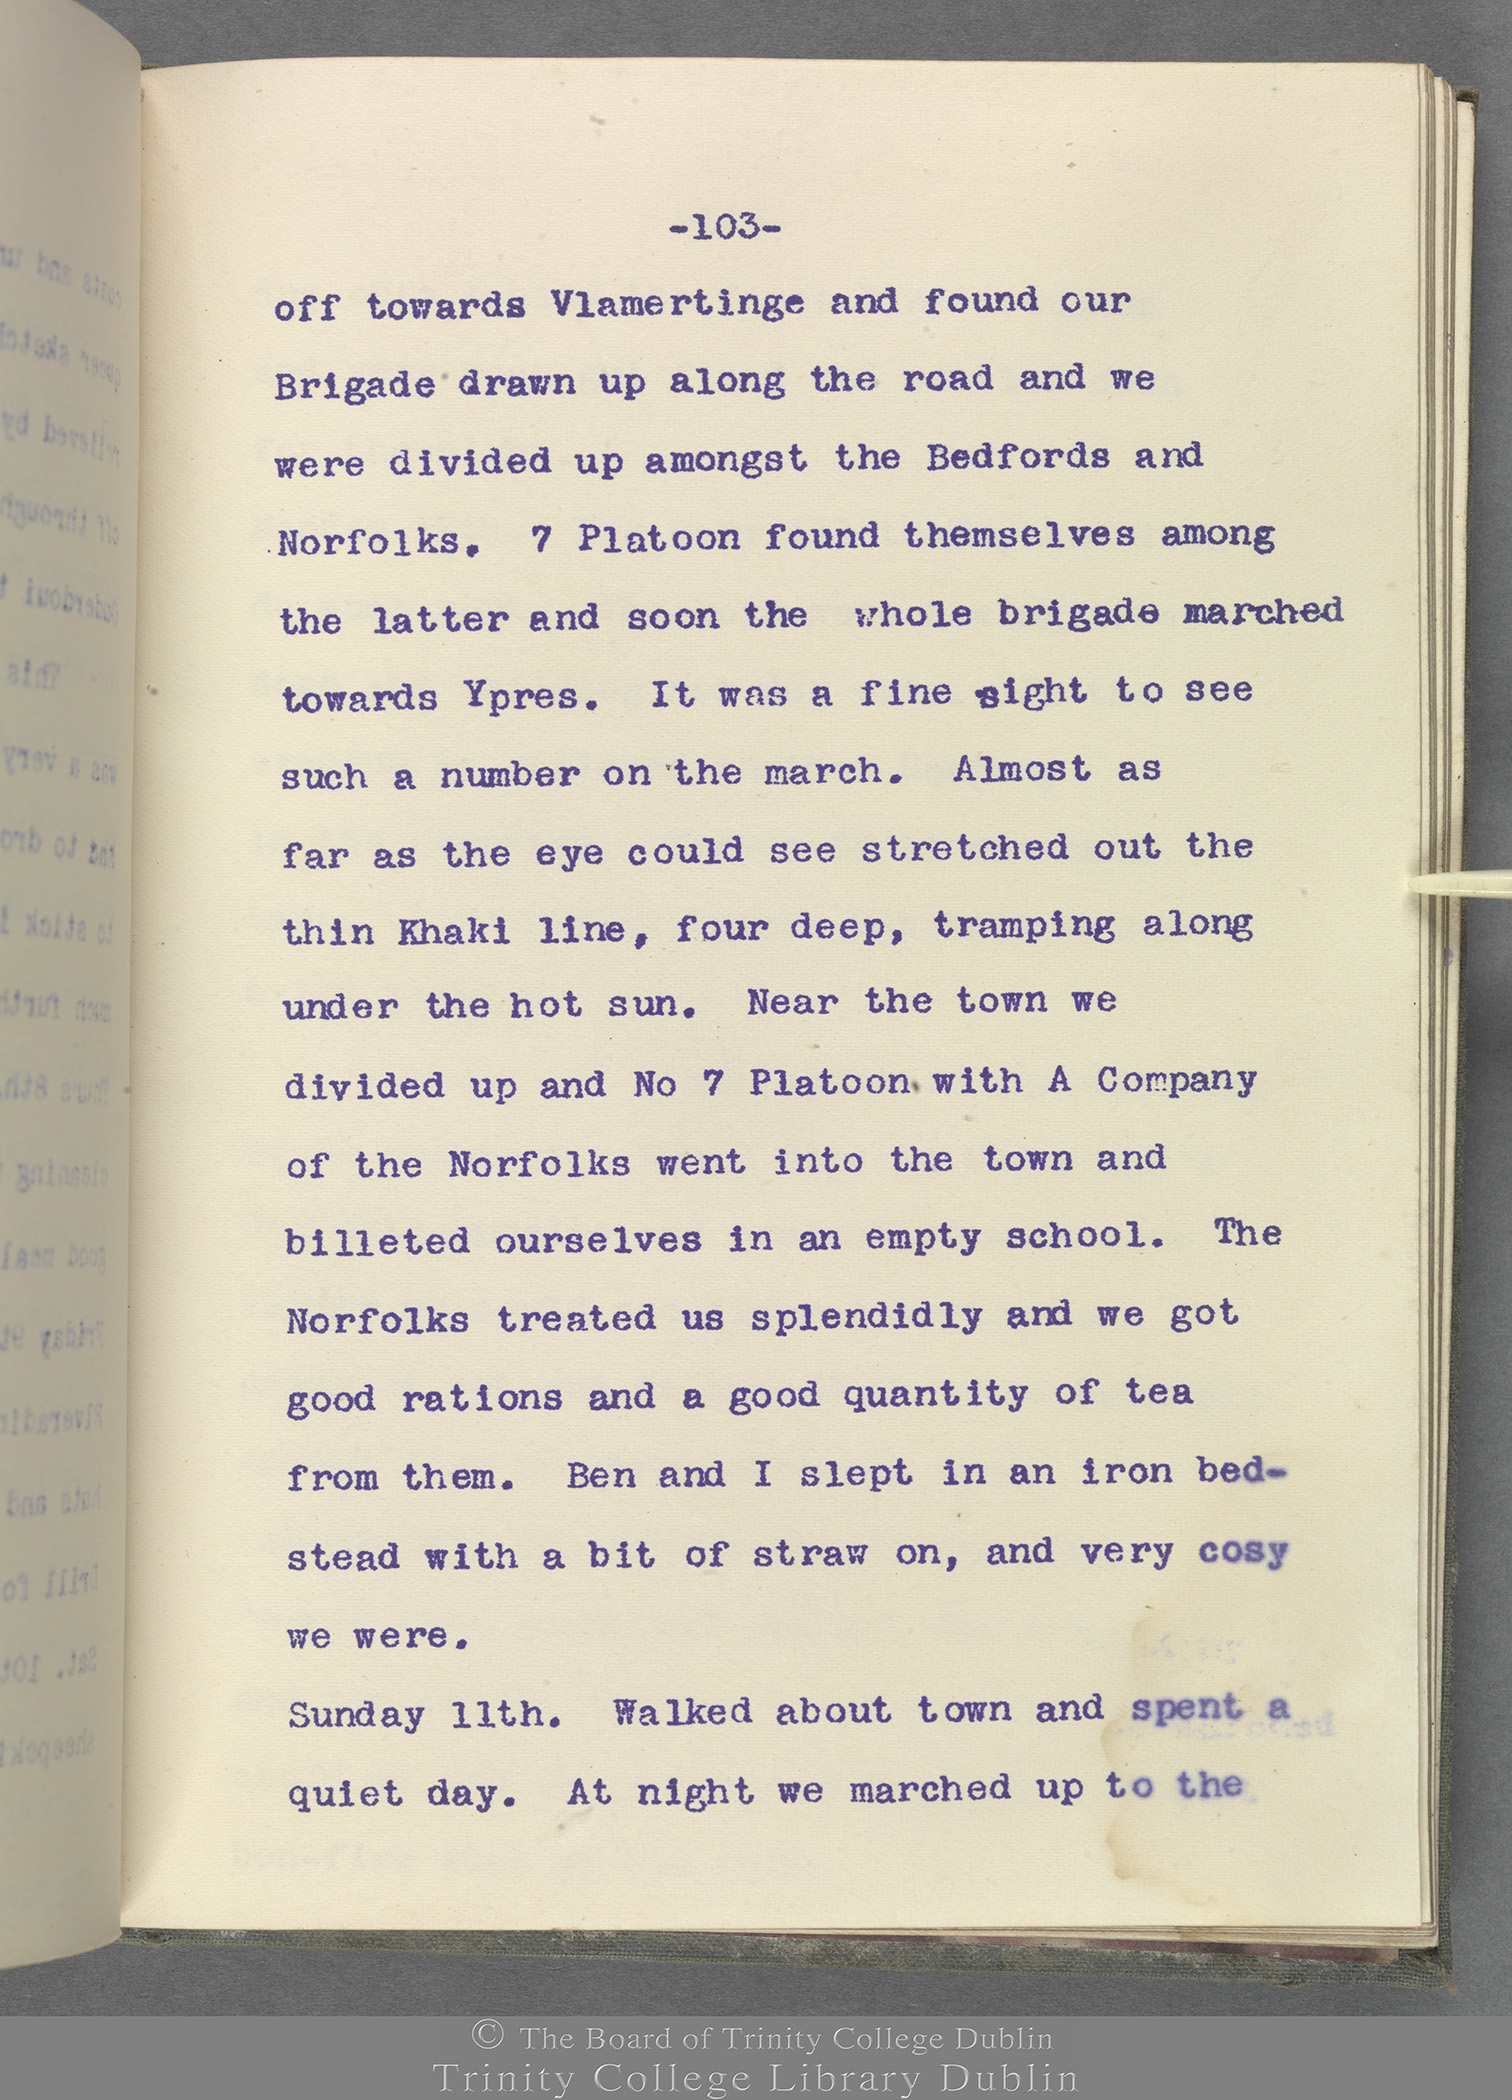 TCD MS 10853 folio 103 recto